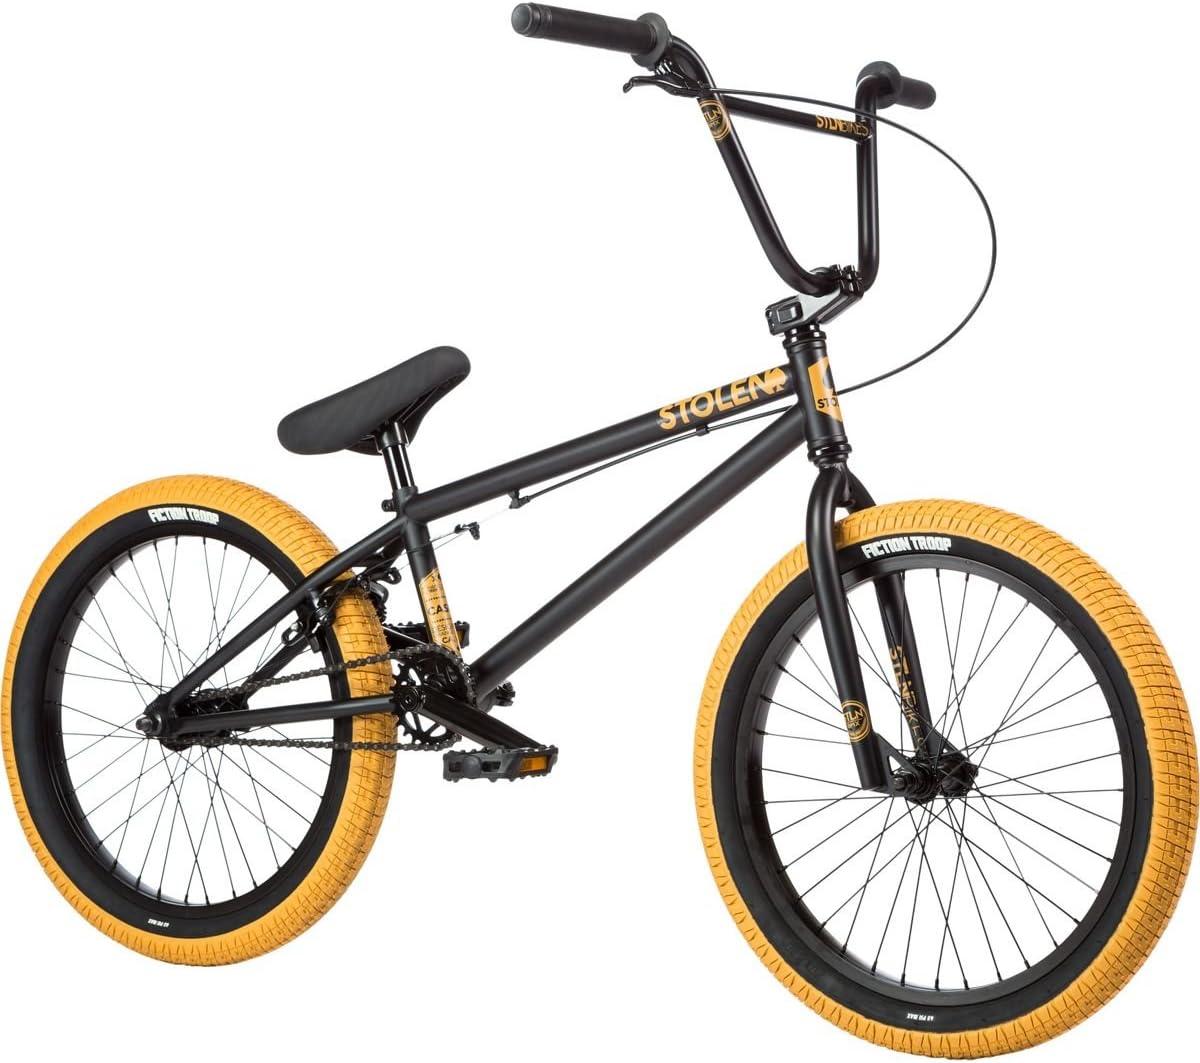 Stolen Casino XS BMX bicicleta tubo superior 2017 19.3